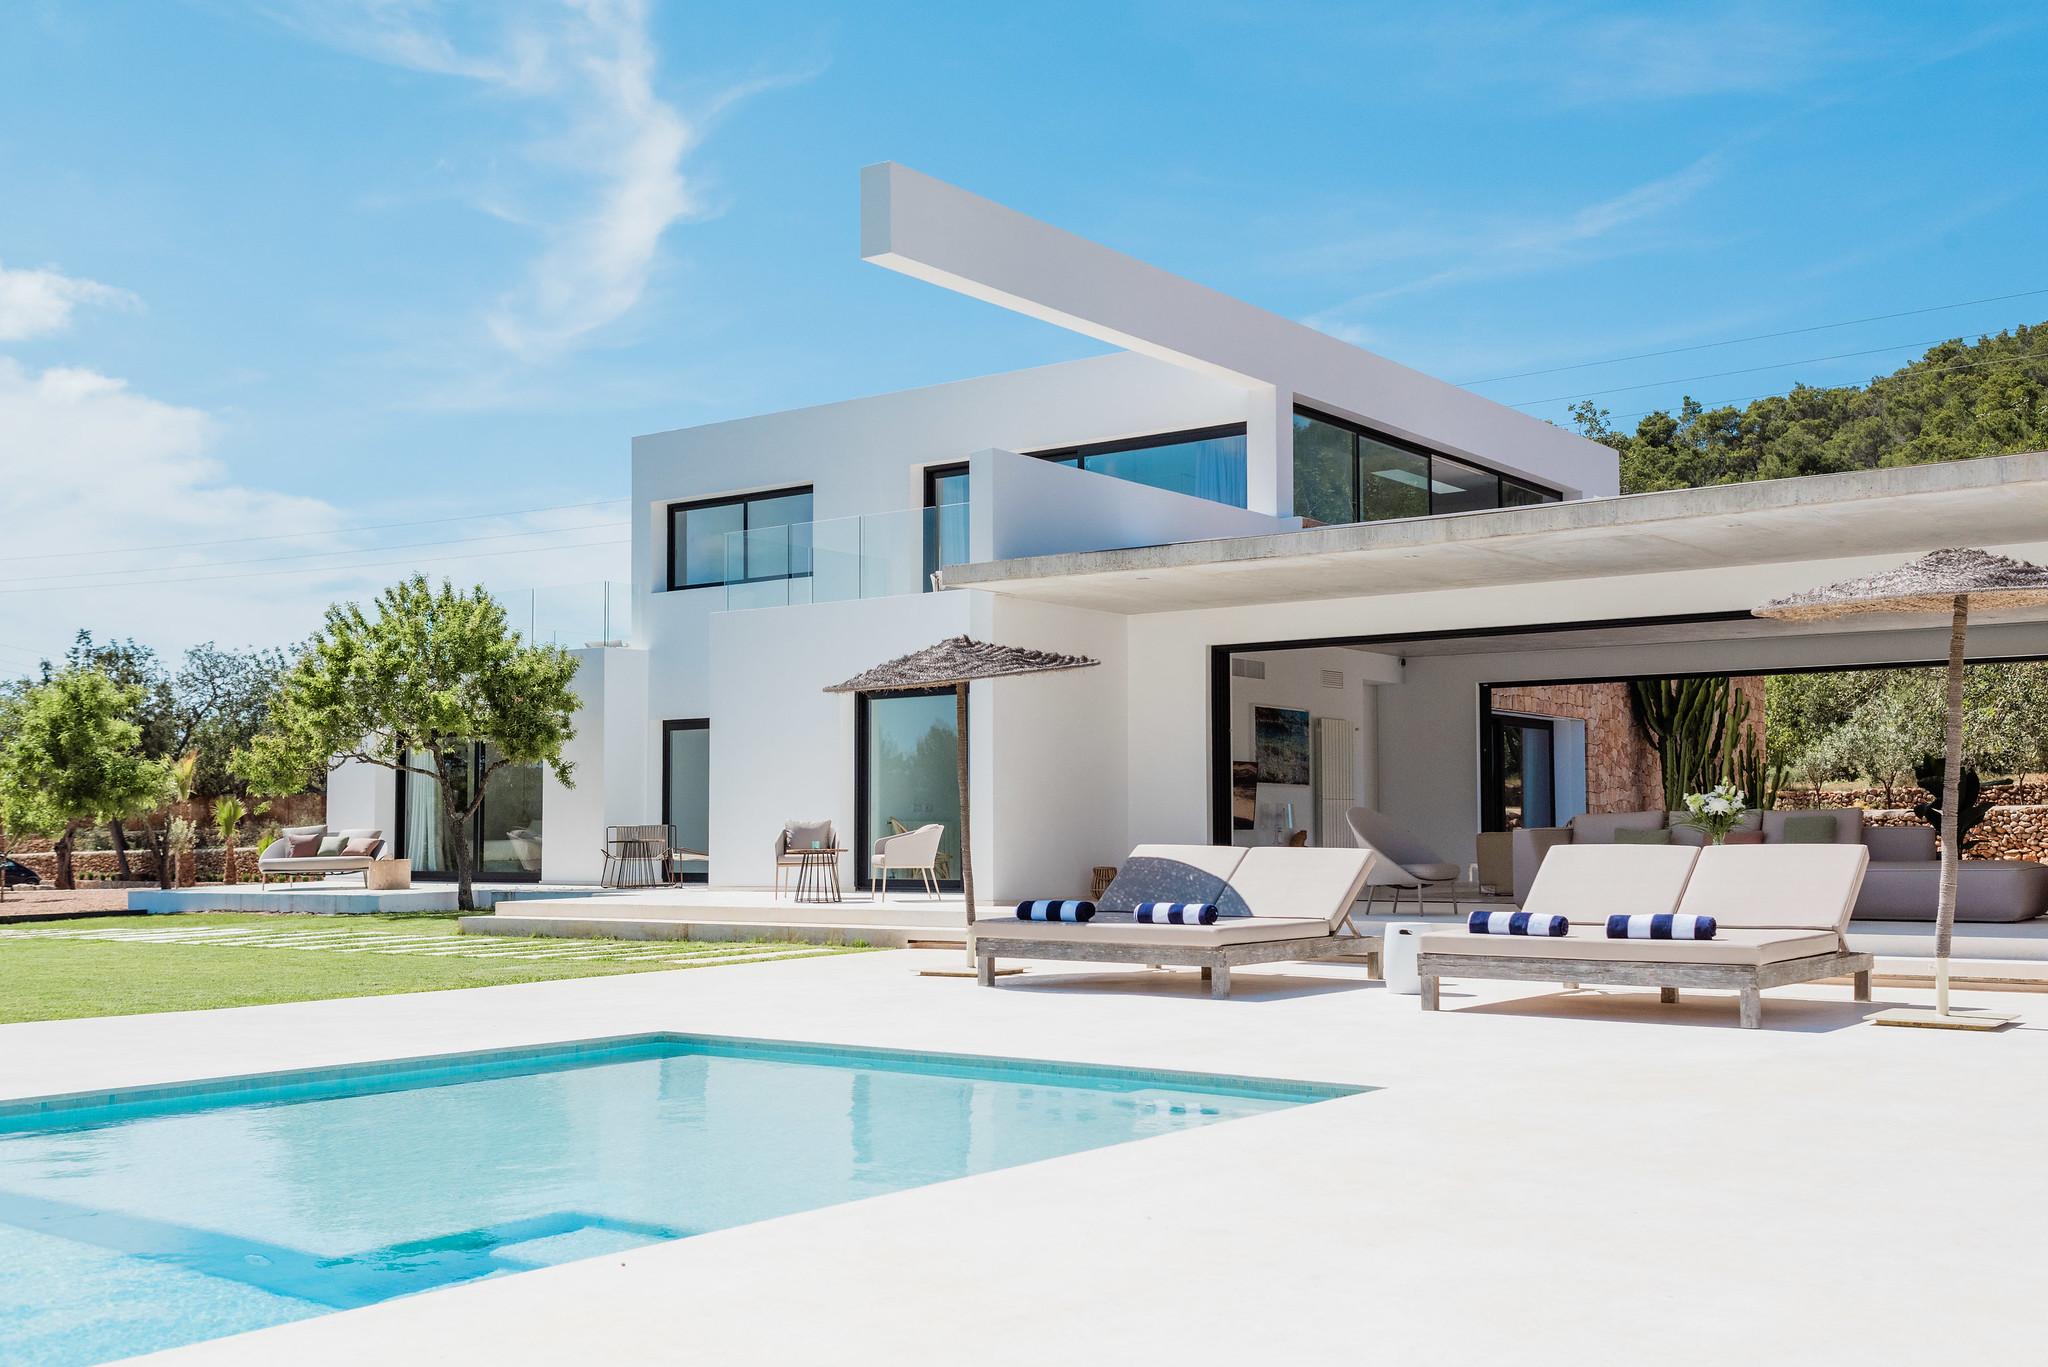 https://www.white-ibiza.com/wp-content/uploads/2020/06/white-ibiza-villas-can-carmen-exterior-view-from-pool.jpg